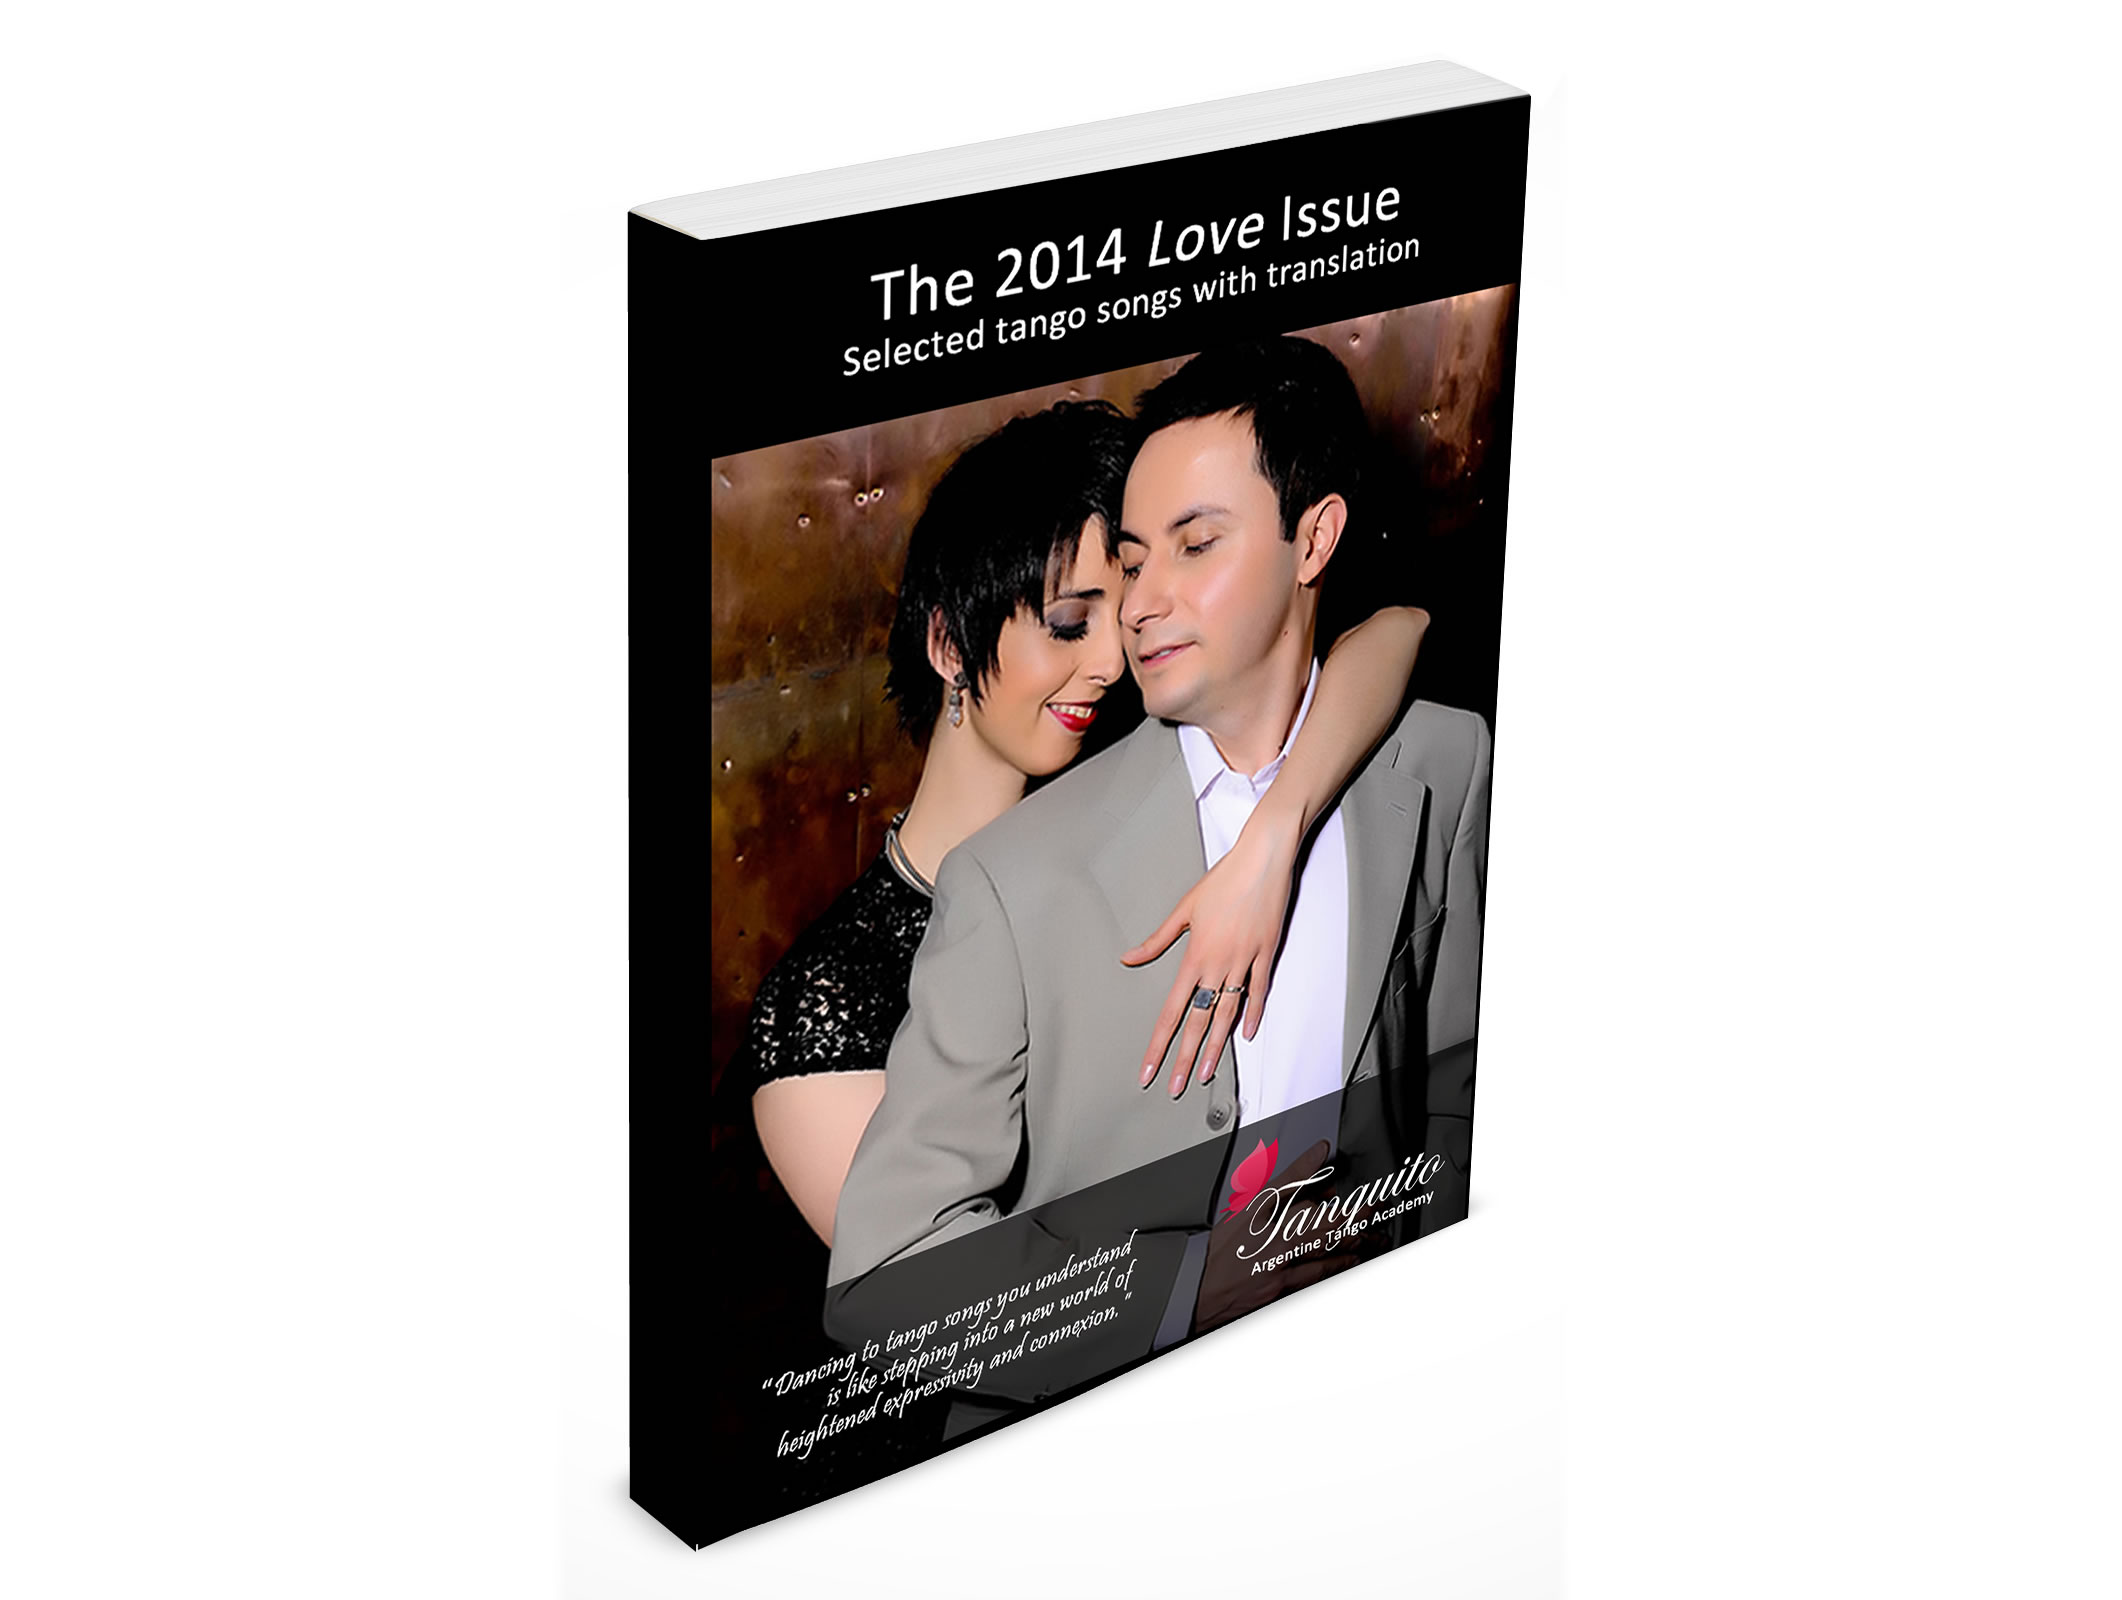 Tango love songs - Valentine issue 2014